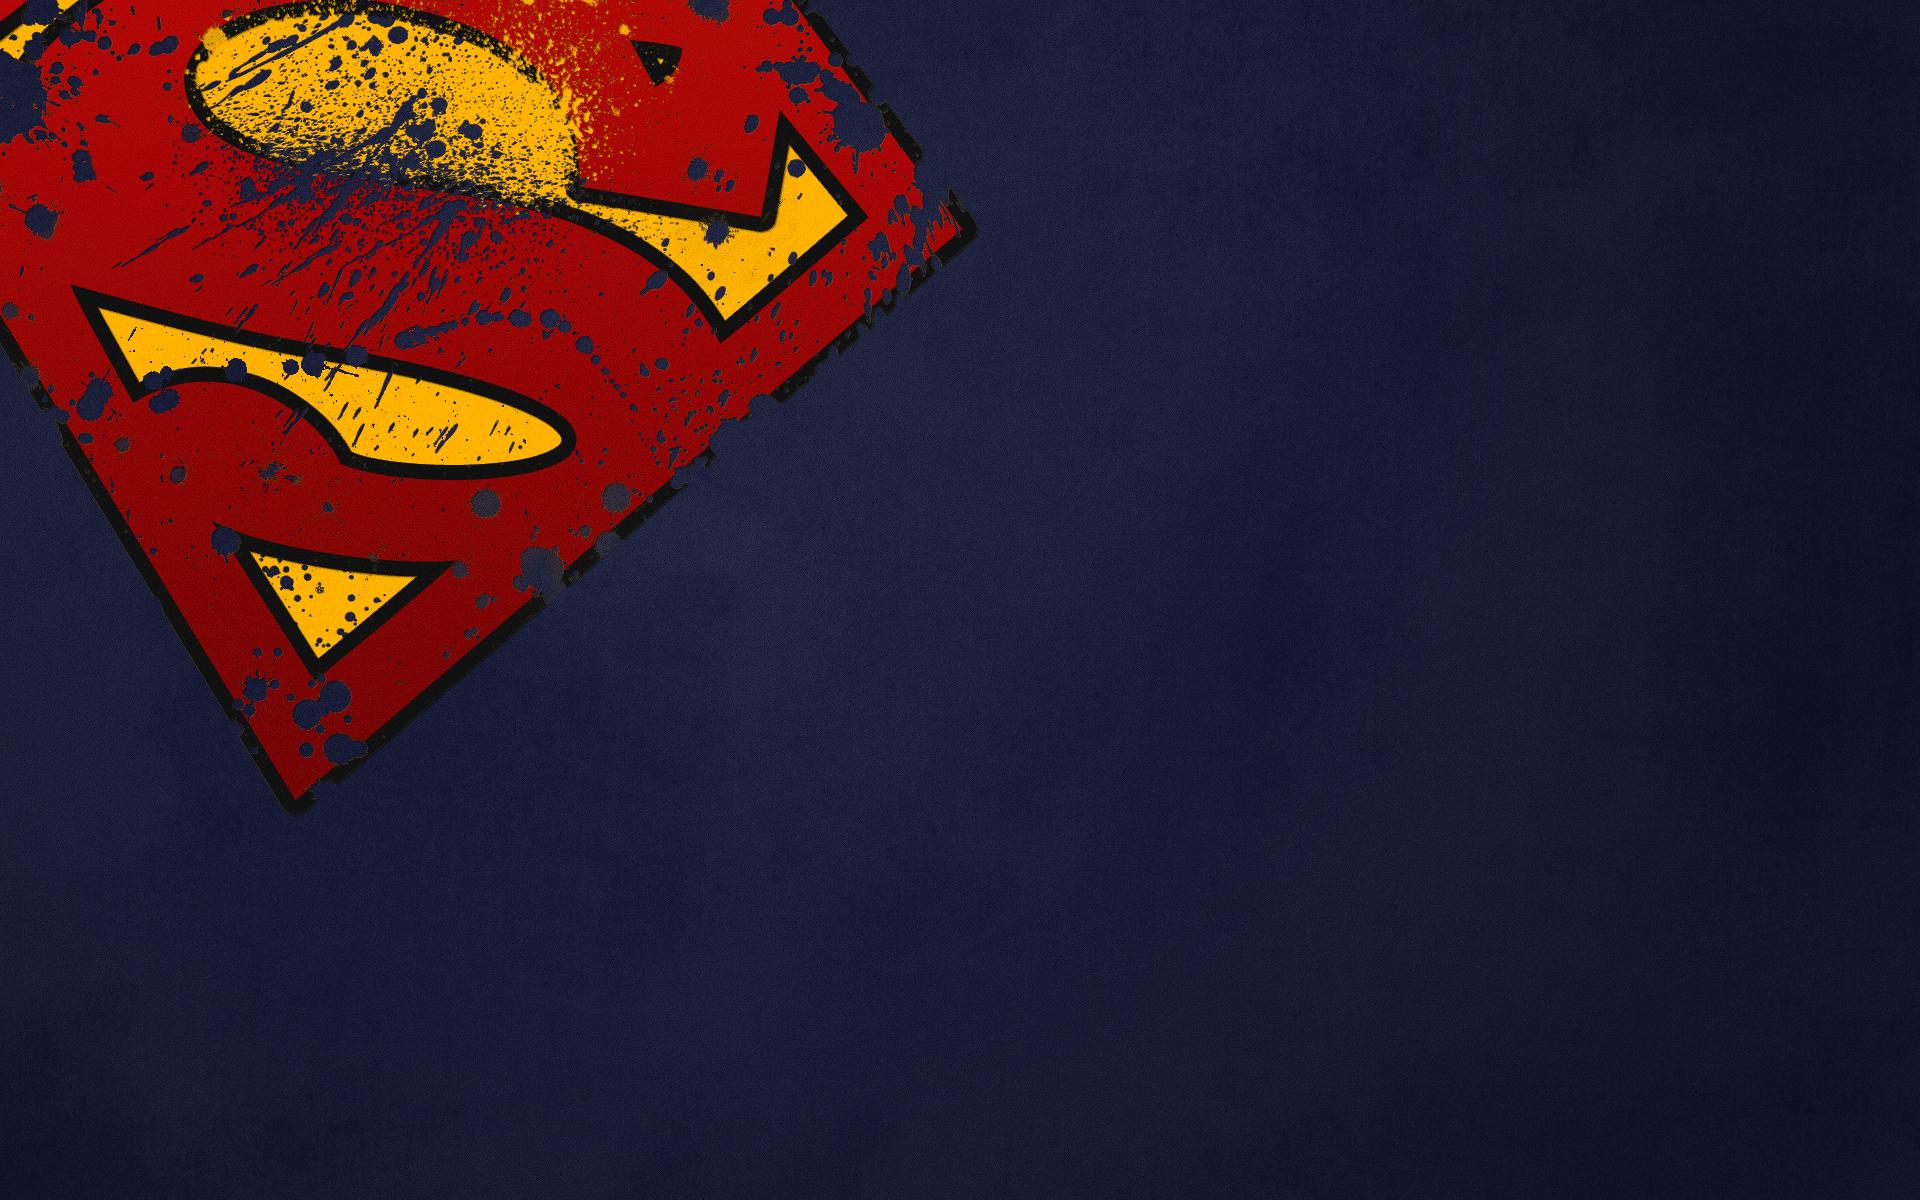 DC Shoes Ics Superman Logo New HD Wallpaper For Your PC Desktop 1920x1200